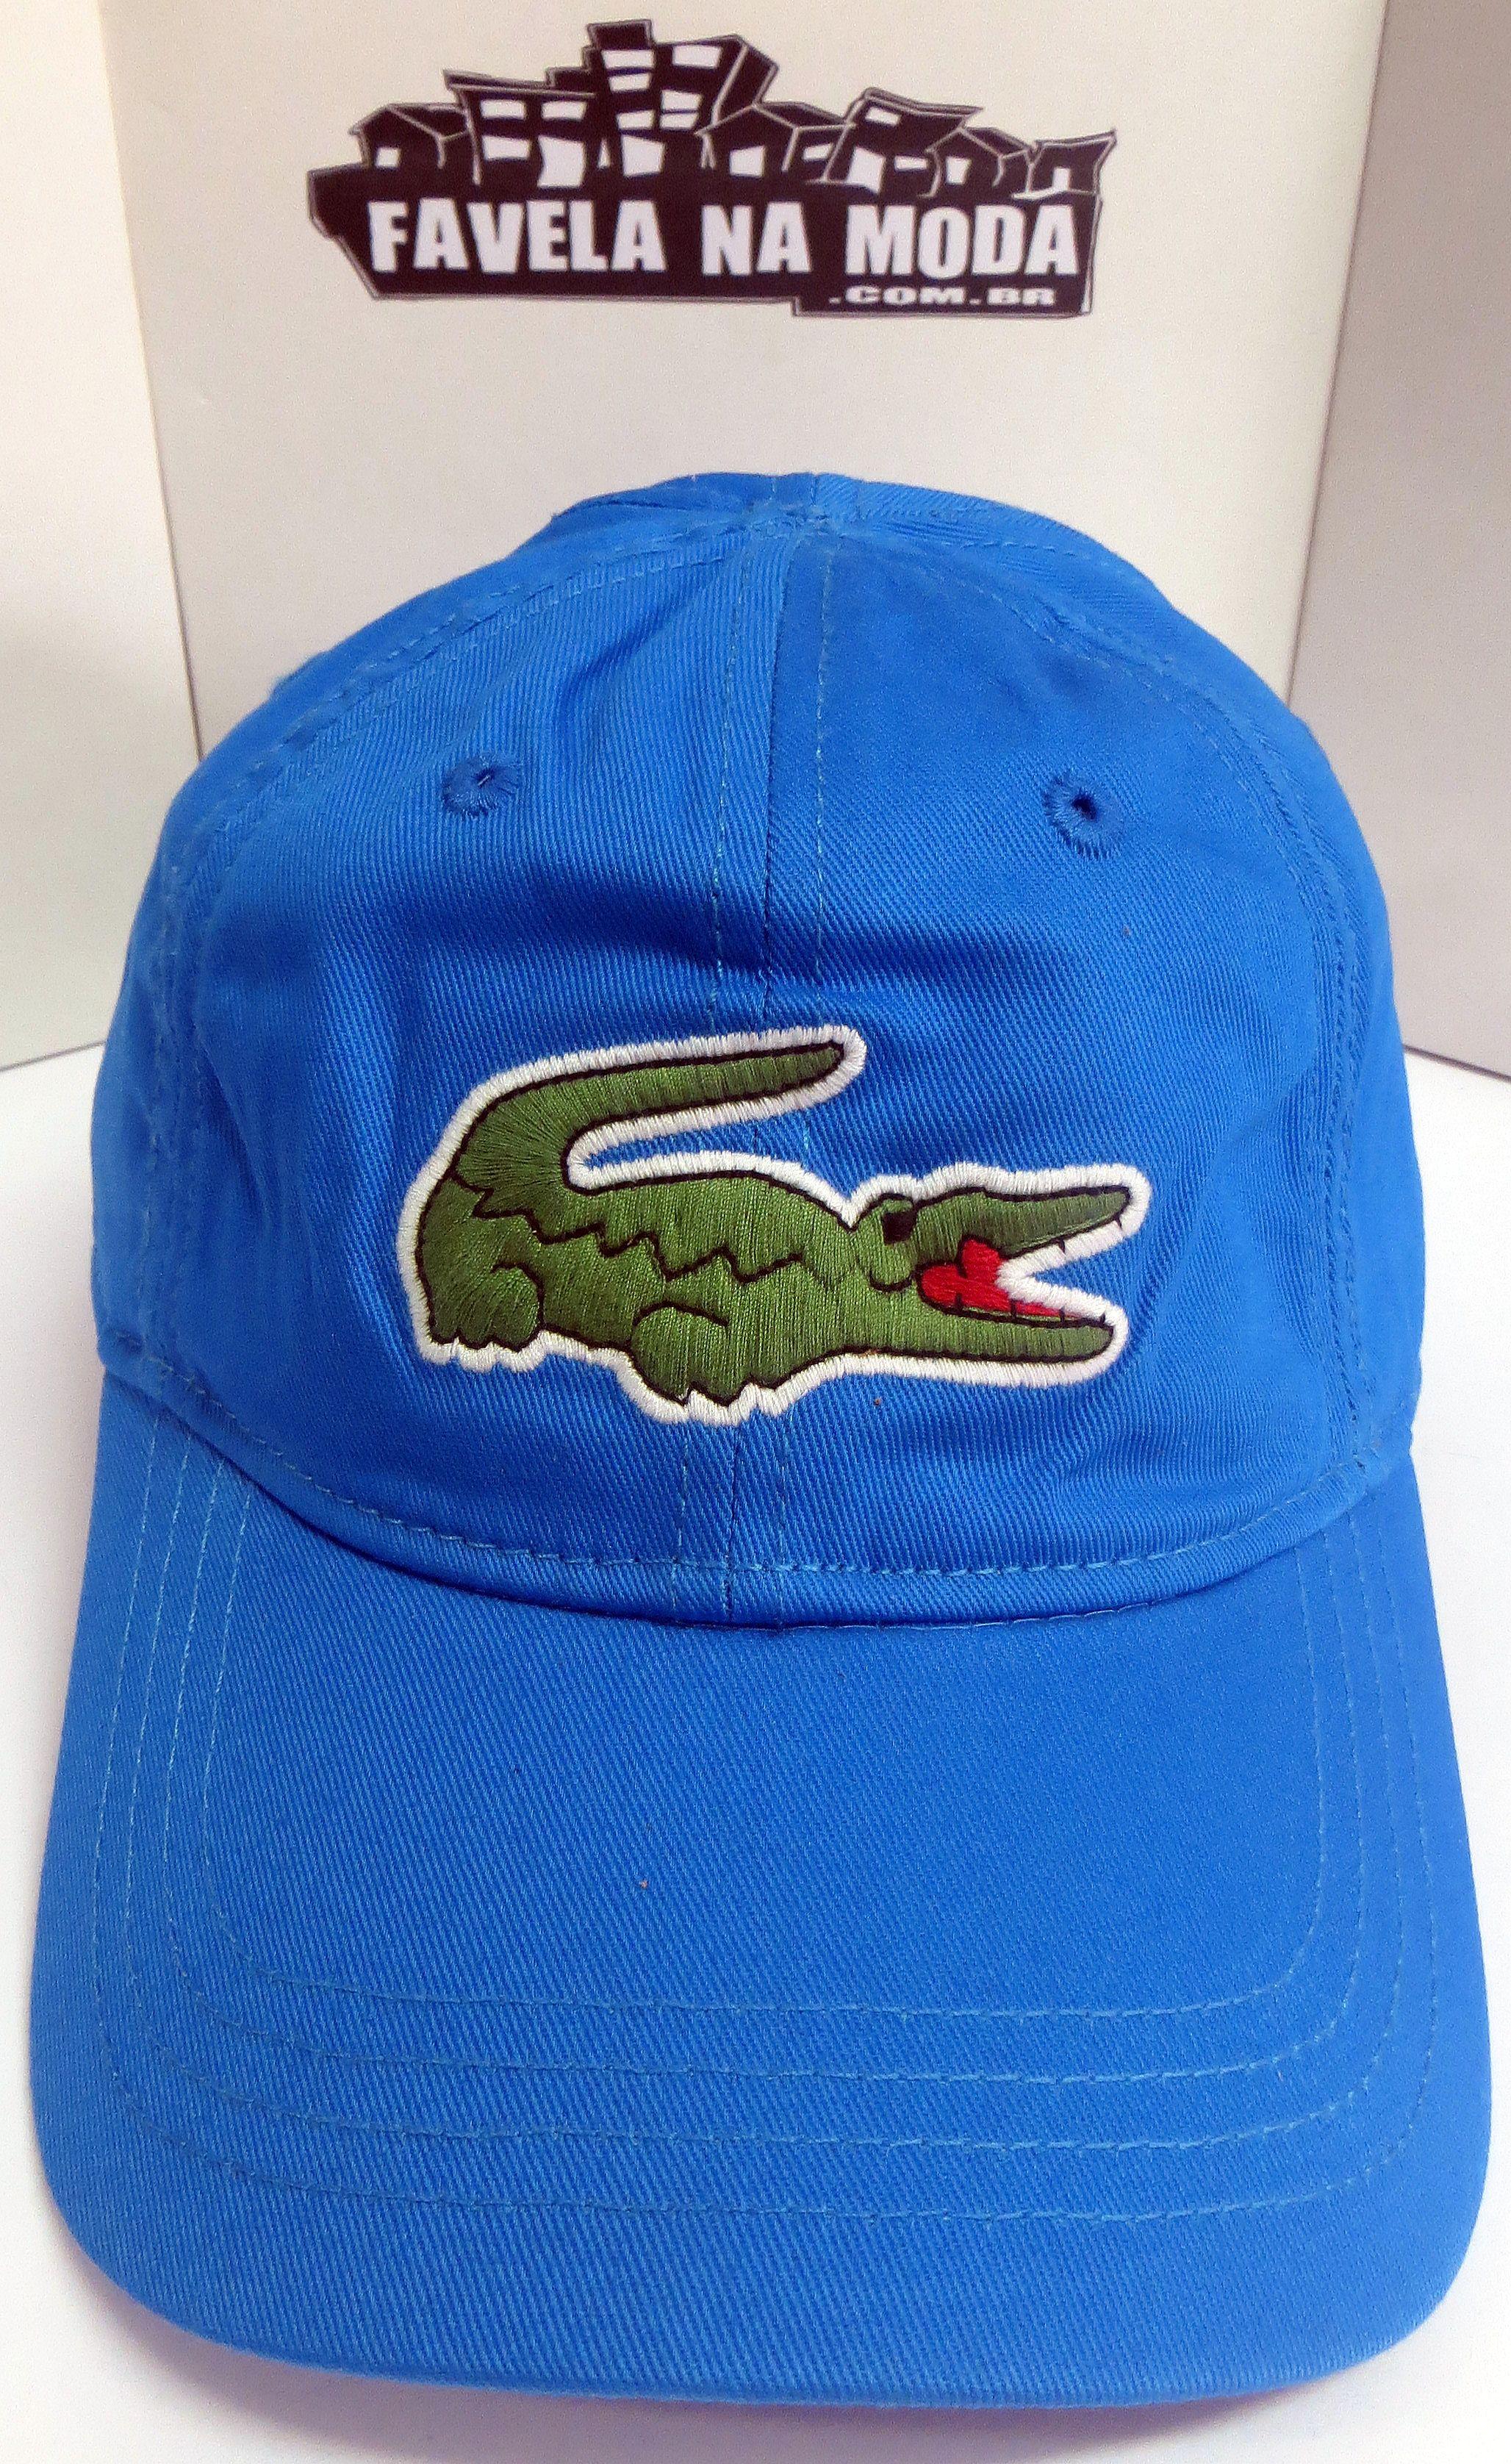 f521b7dbea64f Boné Lacoste de Fivela de Couro - Azul Royal - Big Croc